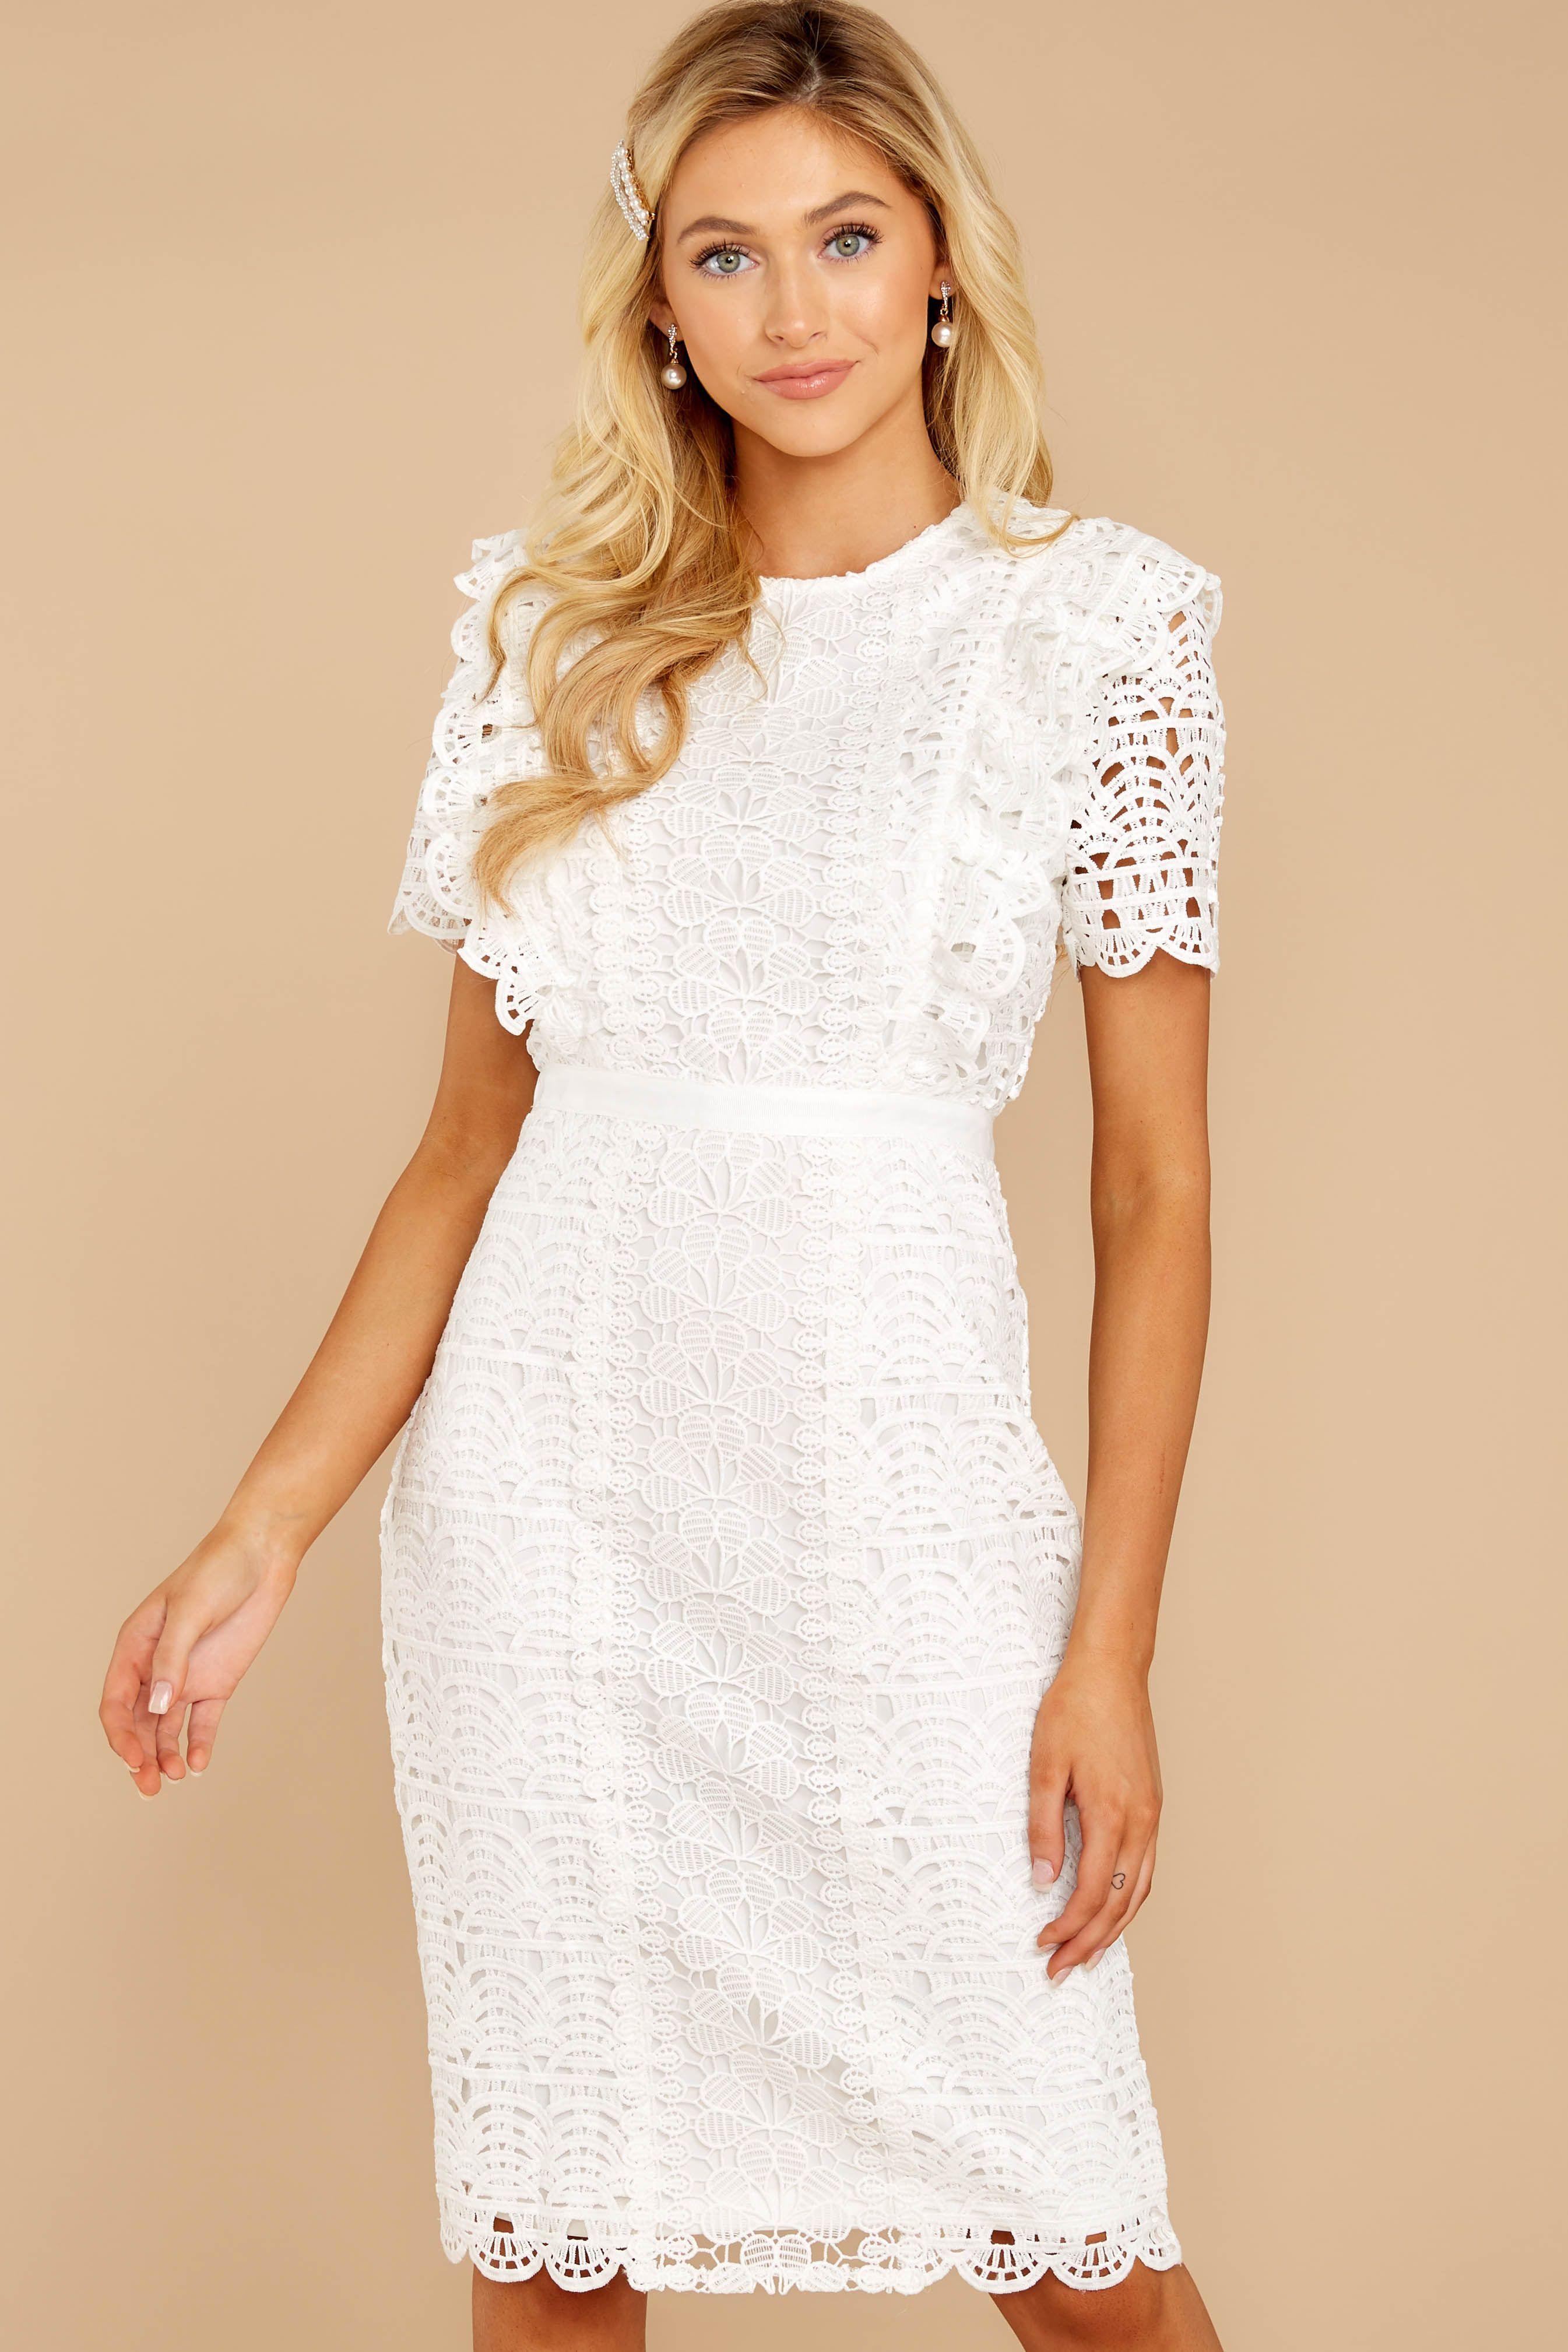 Timeless Combinations White Eyelet Dress Eyelet Dress Outfit Midi Short Sleeve Dress Lace White Dress [ 4035 x 2690 Pixel ]